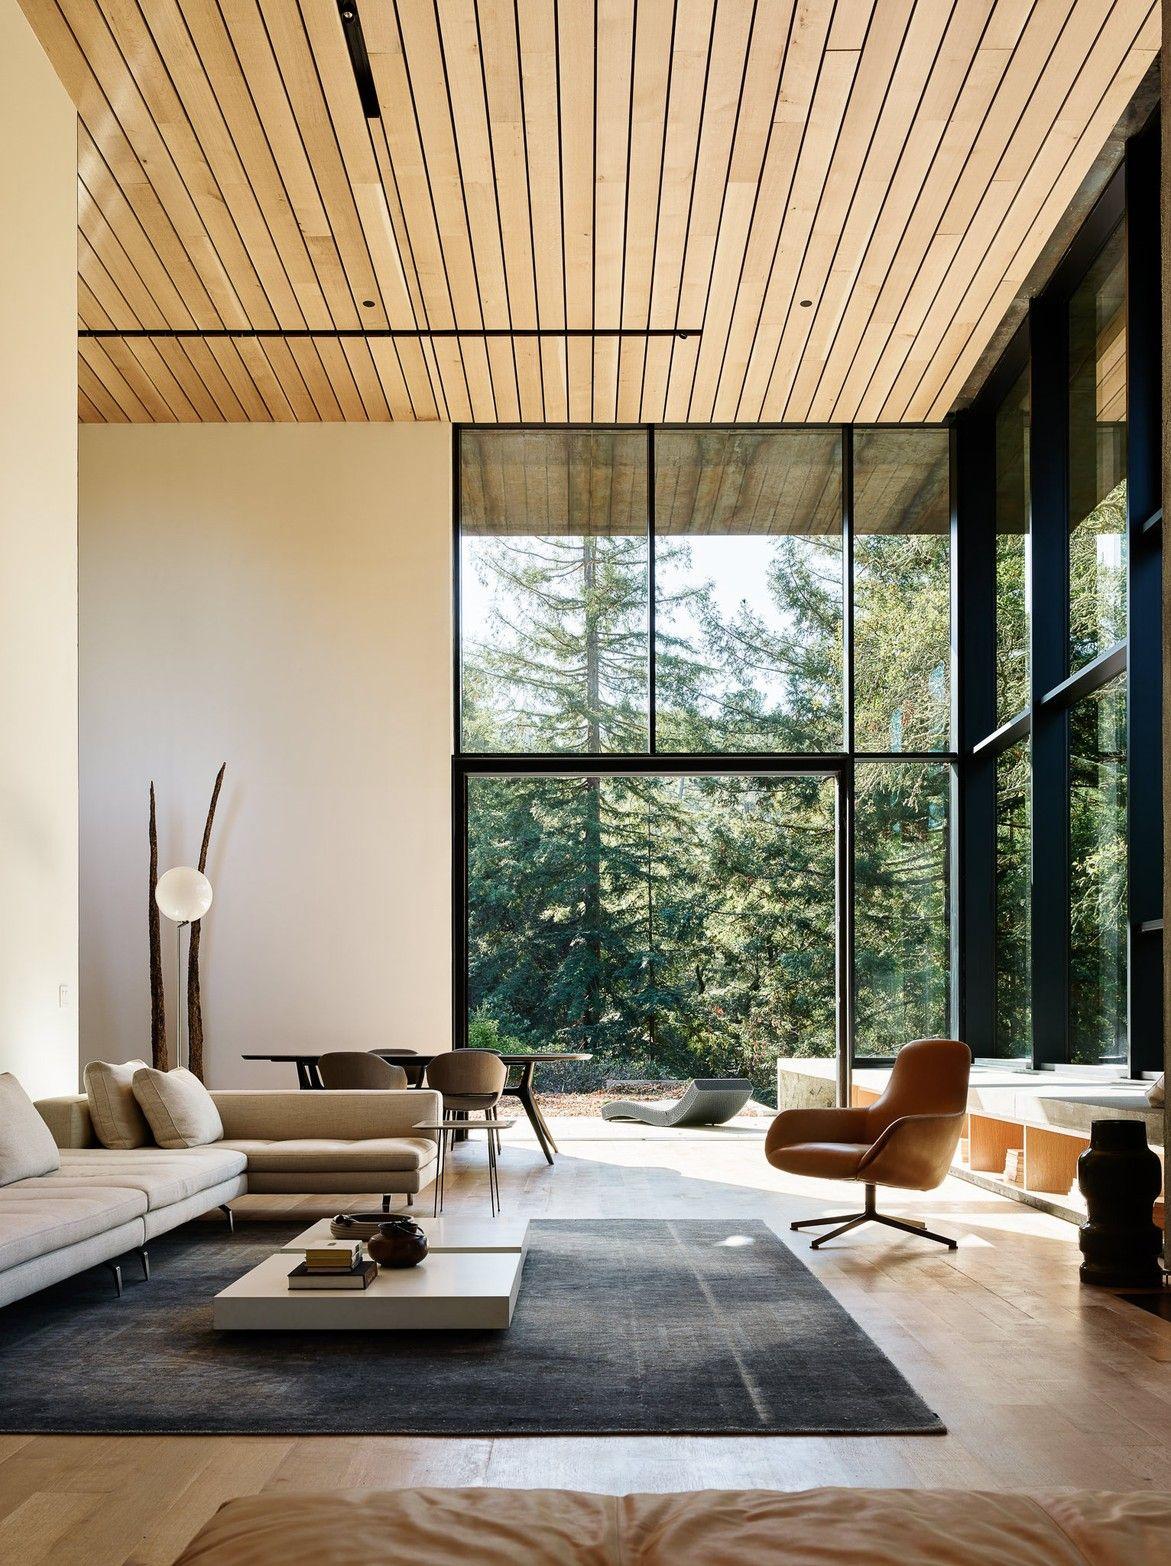 Wordpress Com In 2020 Contemporary Home Decor Luxury Interior Design House Interior